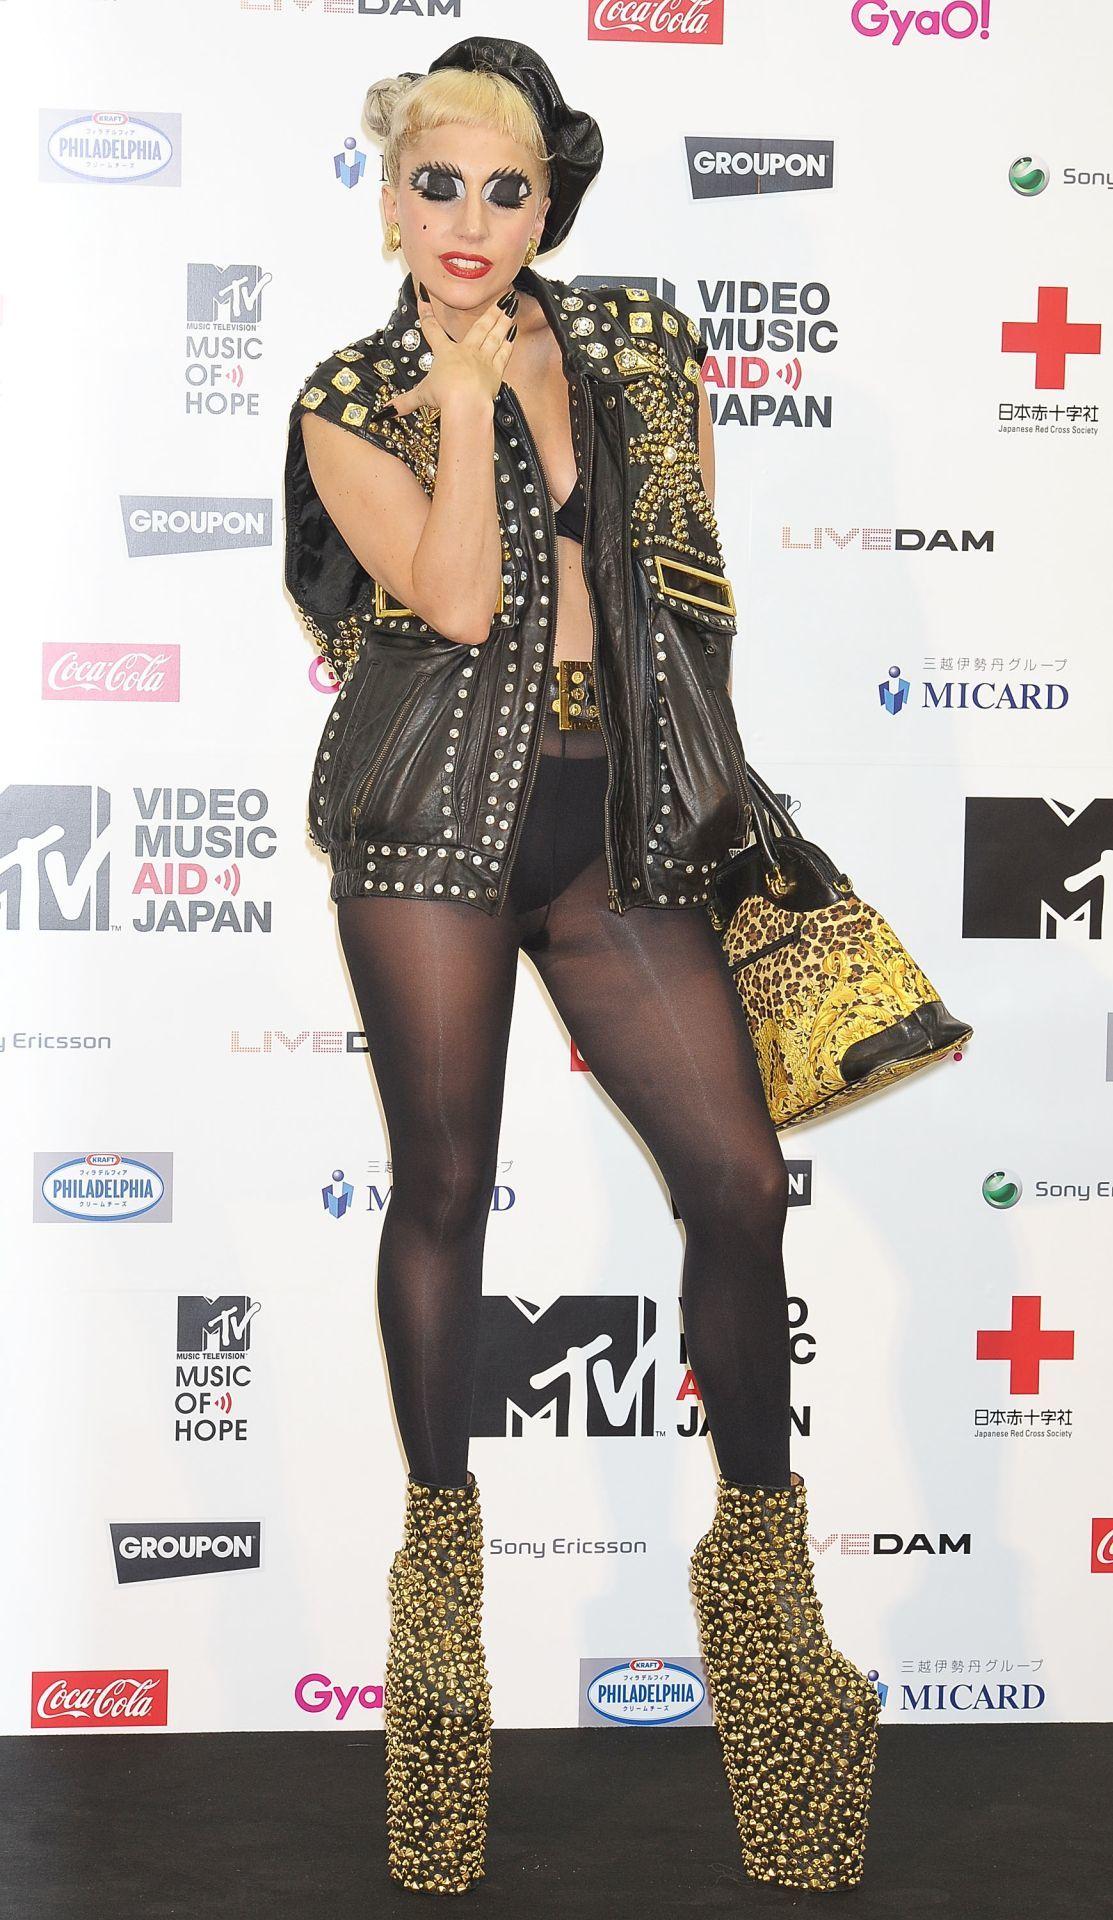 Lady Gaga a 2011-es MTV Video Music Aid Japan rendezvényen